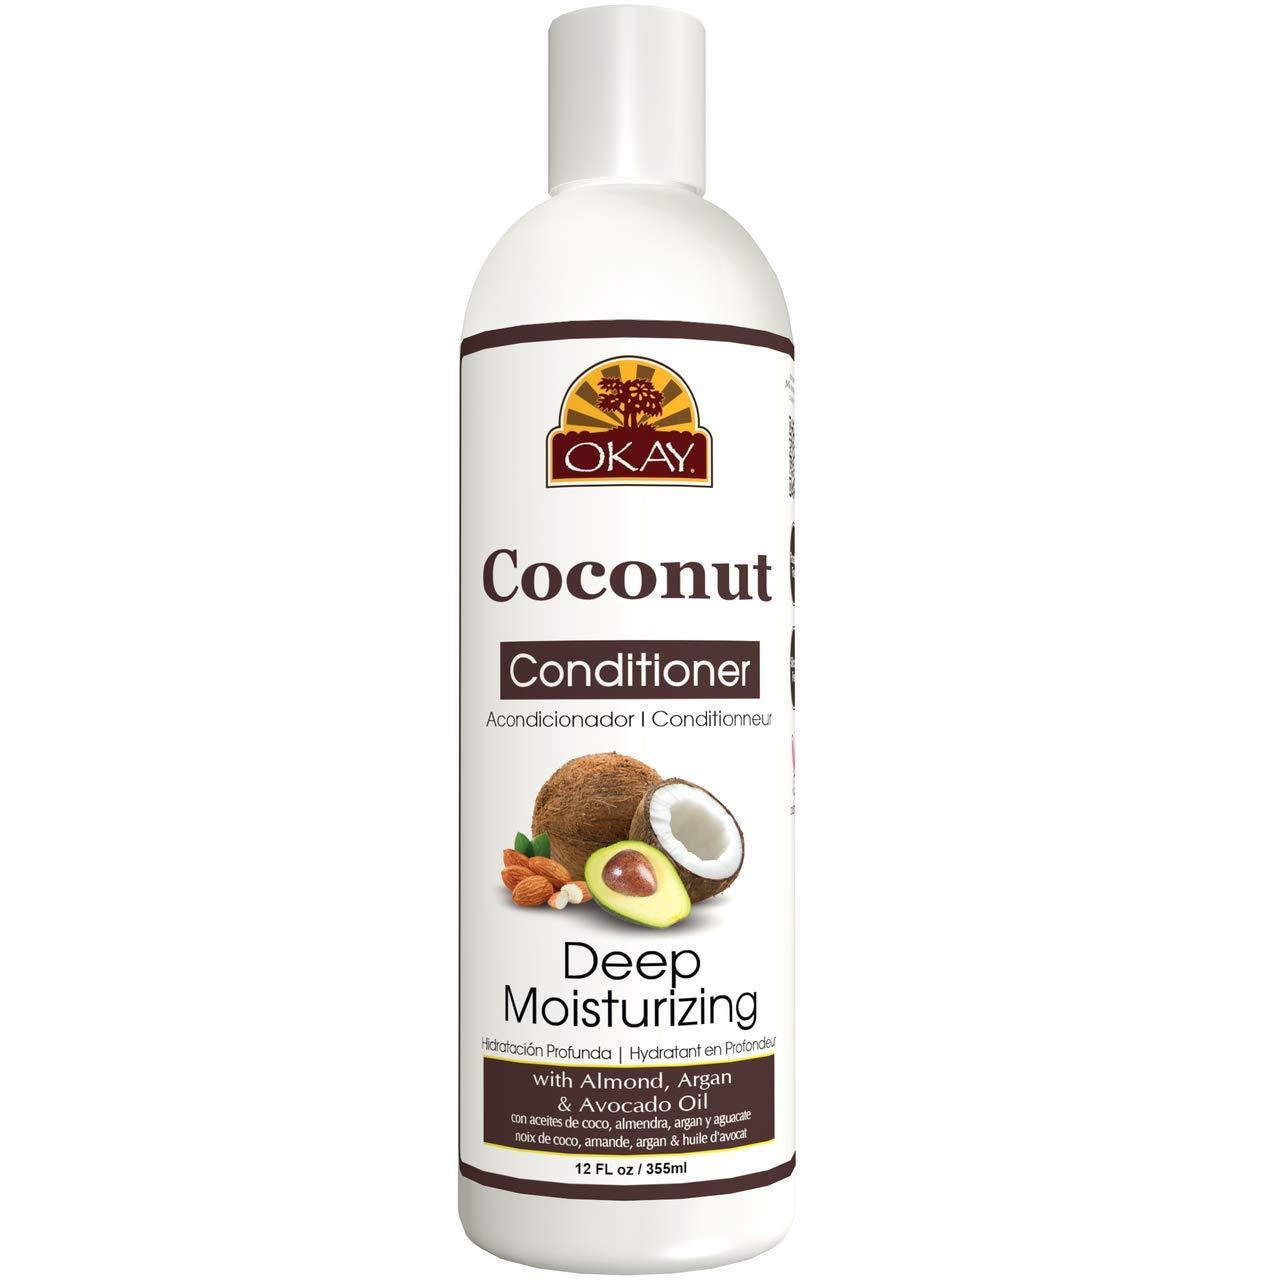 Okay Coconut Oil Deep Moisturizing Conditioner, 12 Oz